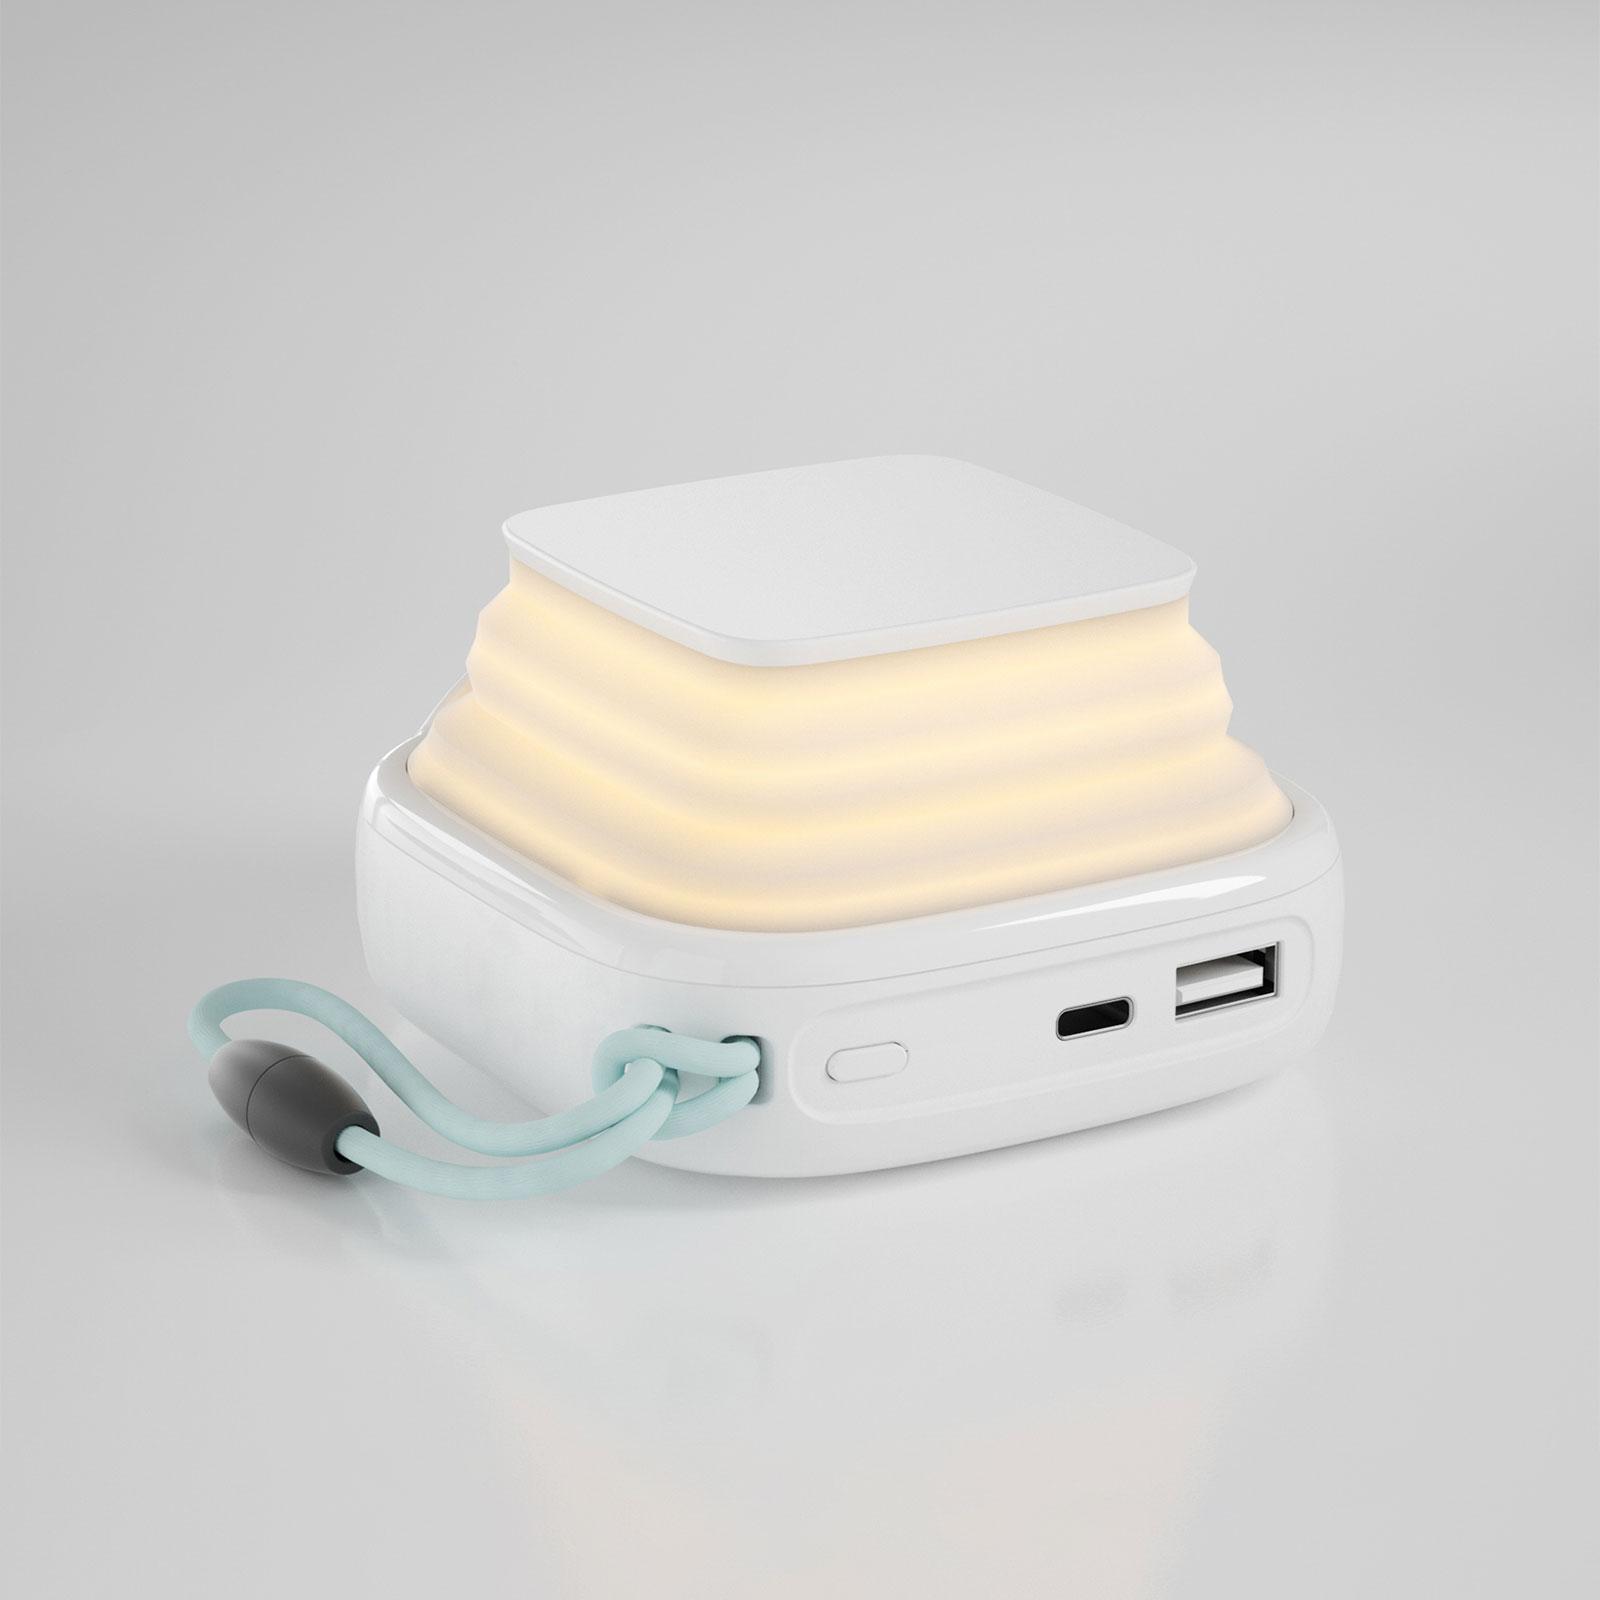 MiPow PopCandle 10000 mobilladdare, nattlampa